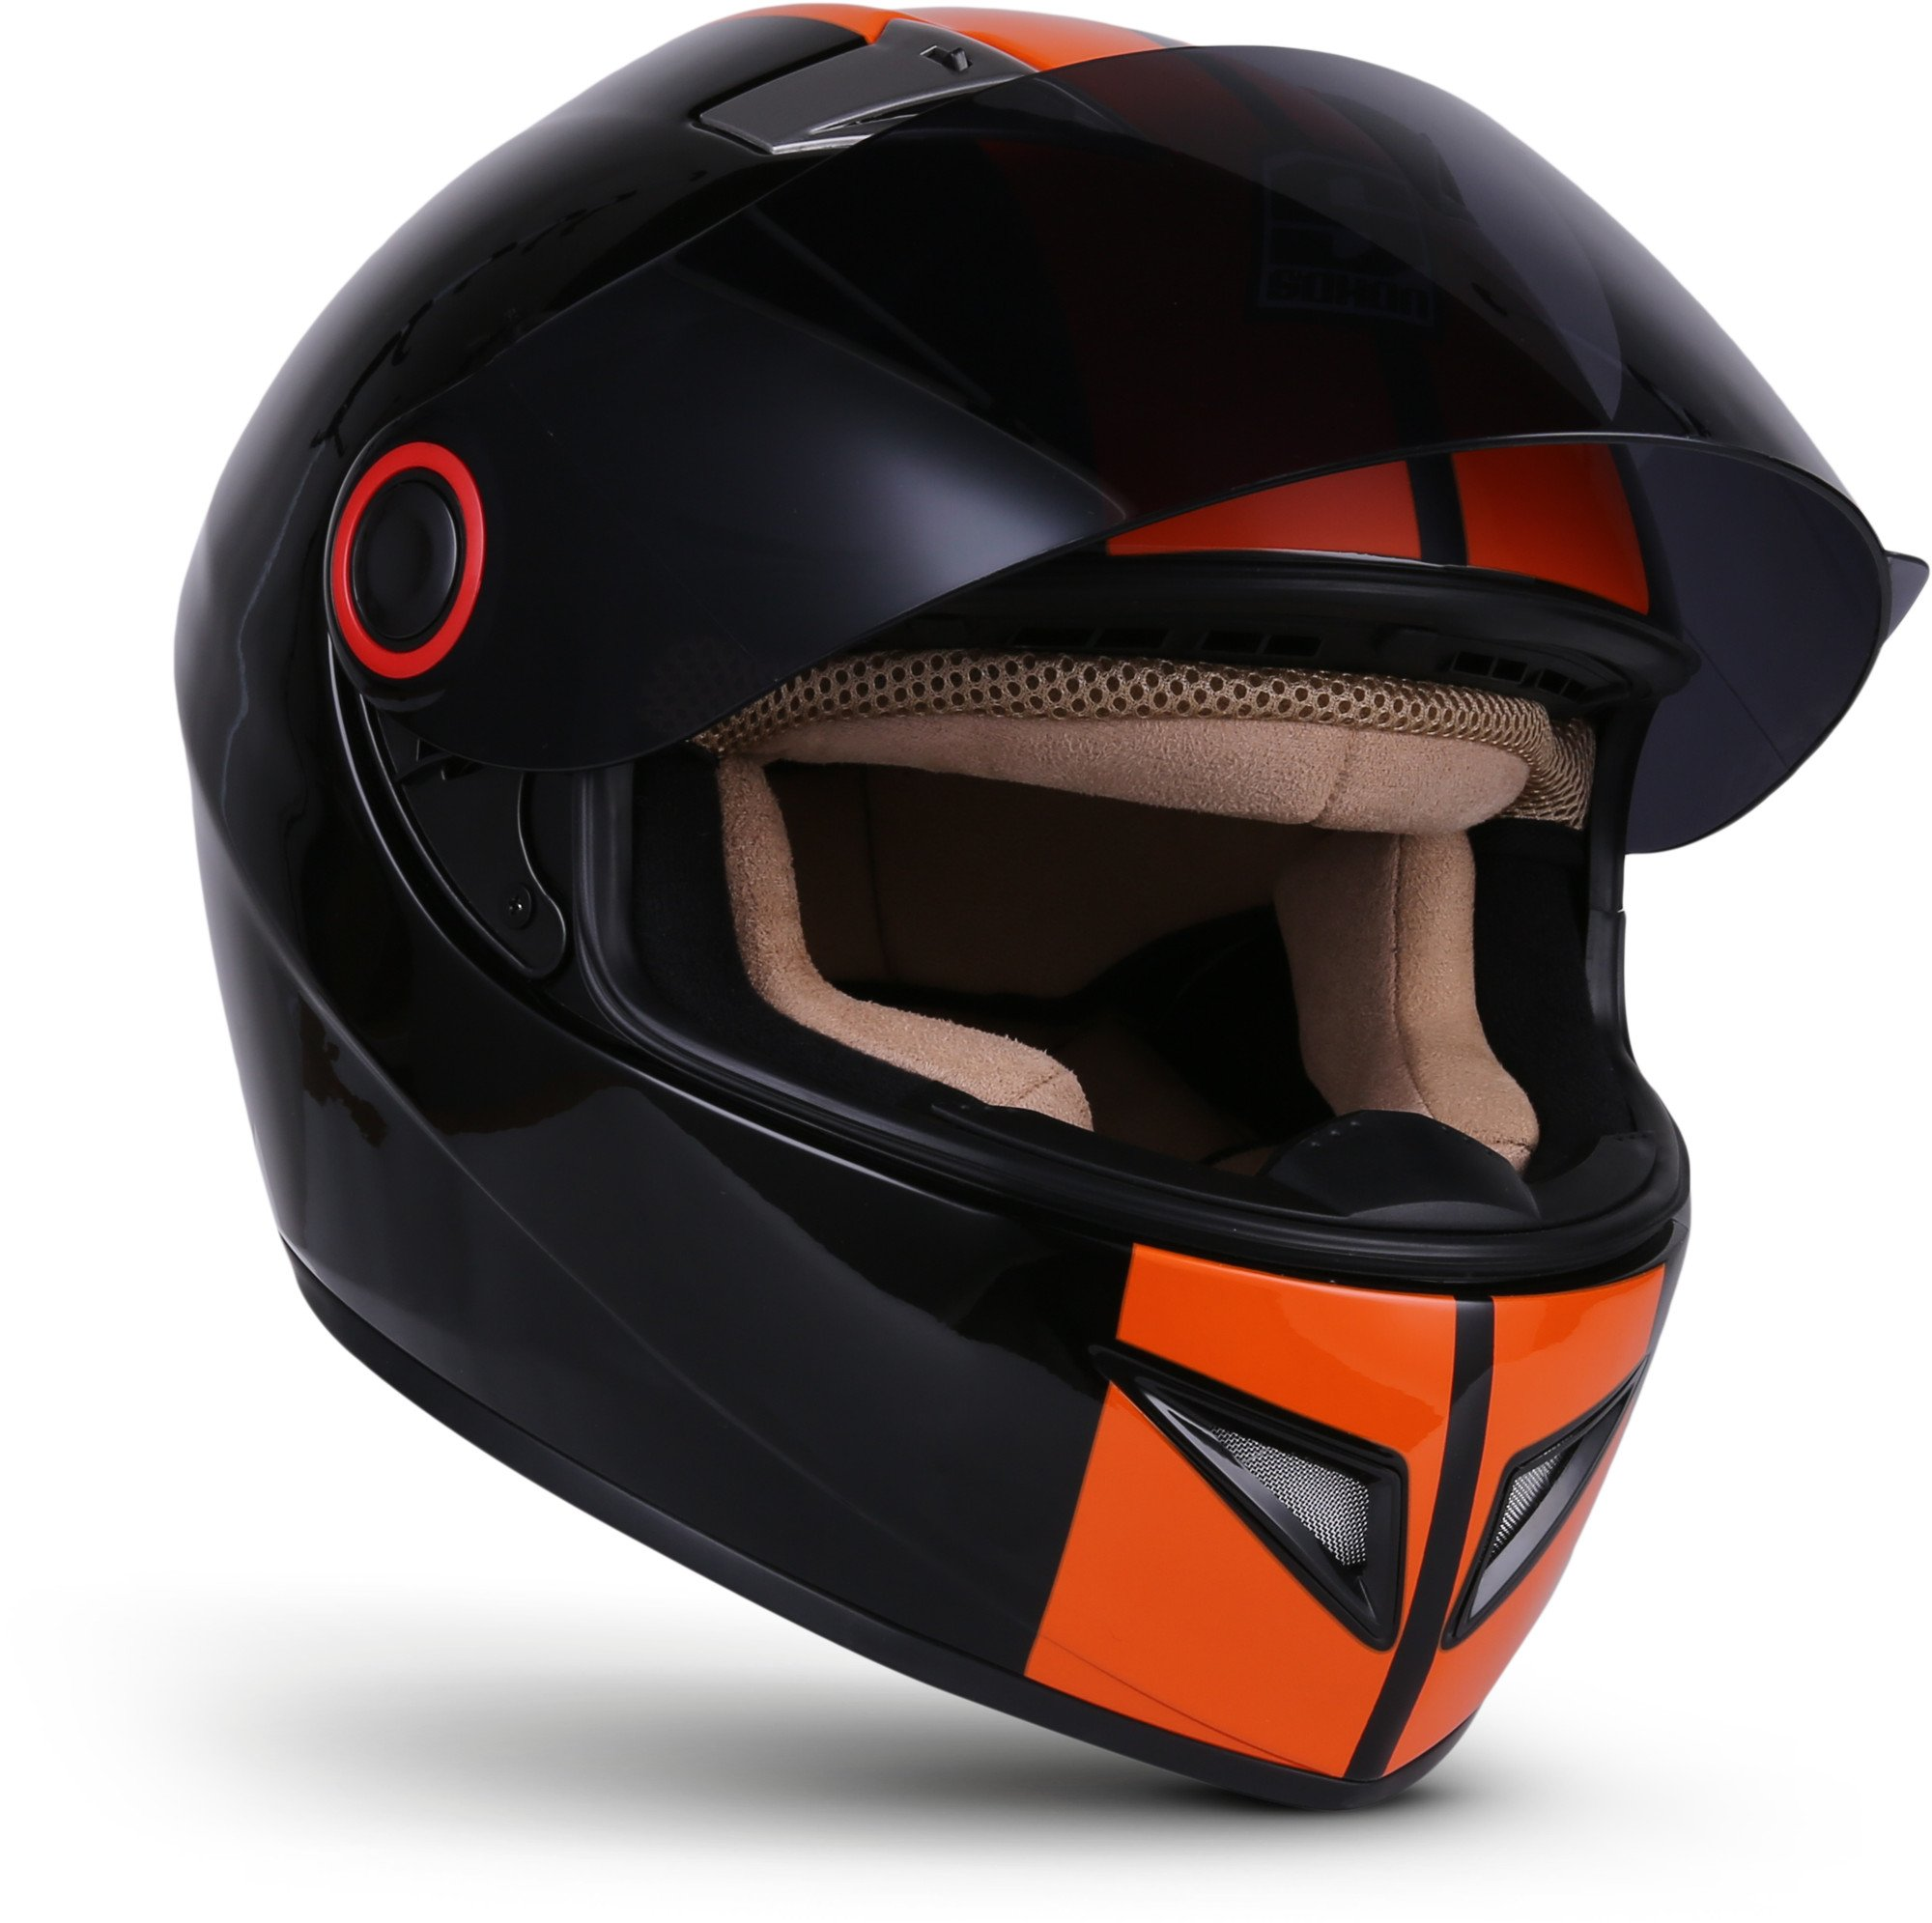 53-54 cm SOXON Motorcycle Helmet Silver Size S